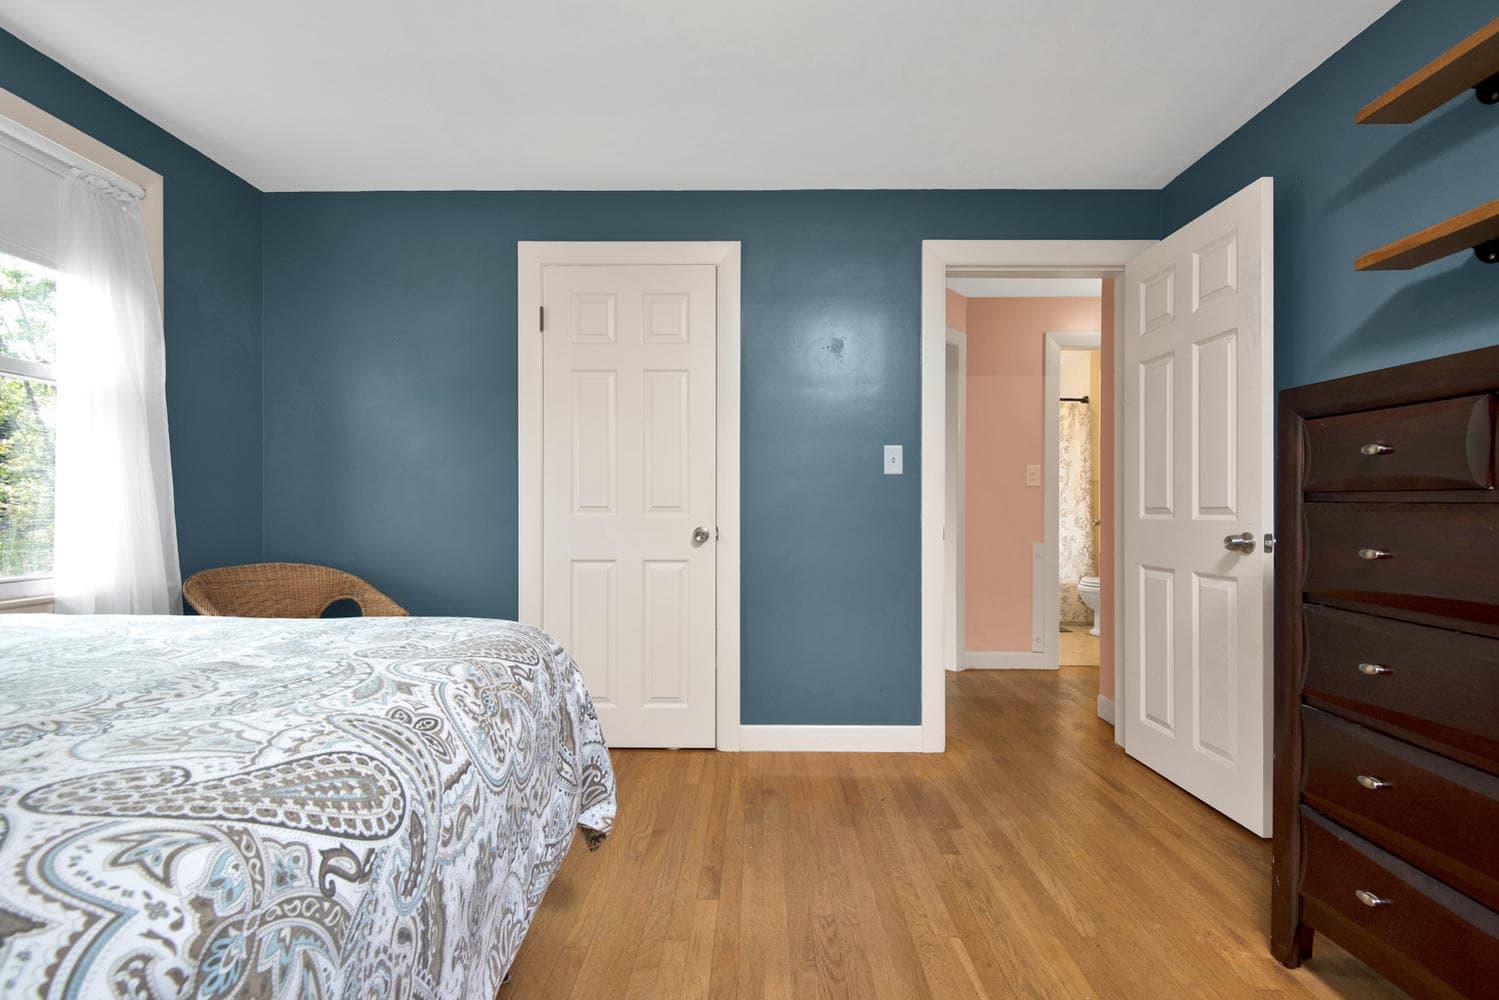 105 Rowe Ave Portland ME 04102-large-013-20-Bedroom 1-1499x1000-72dpi.jpg